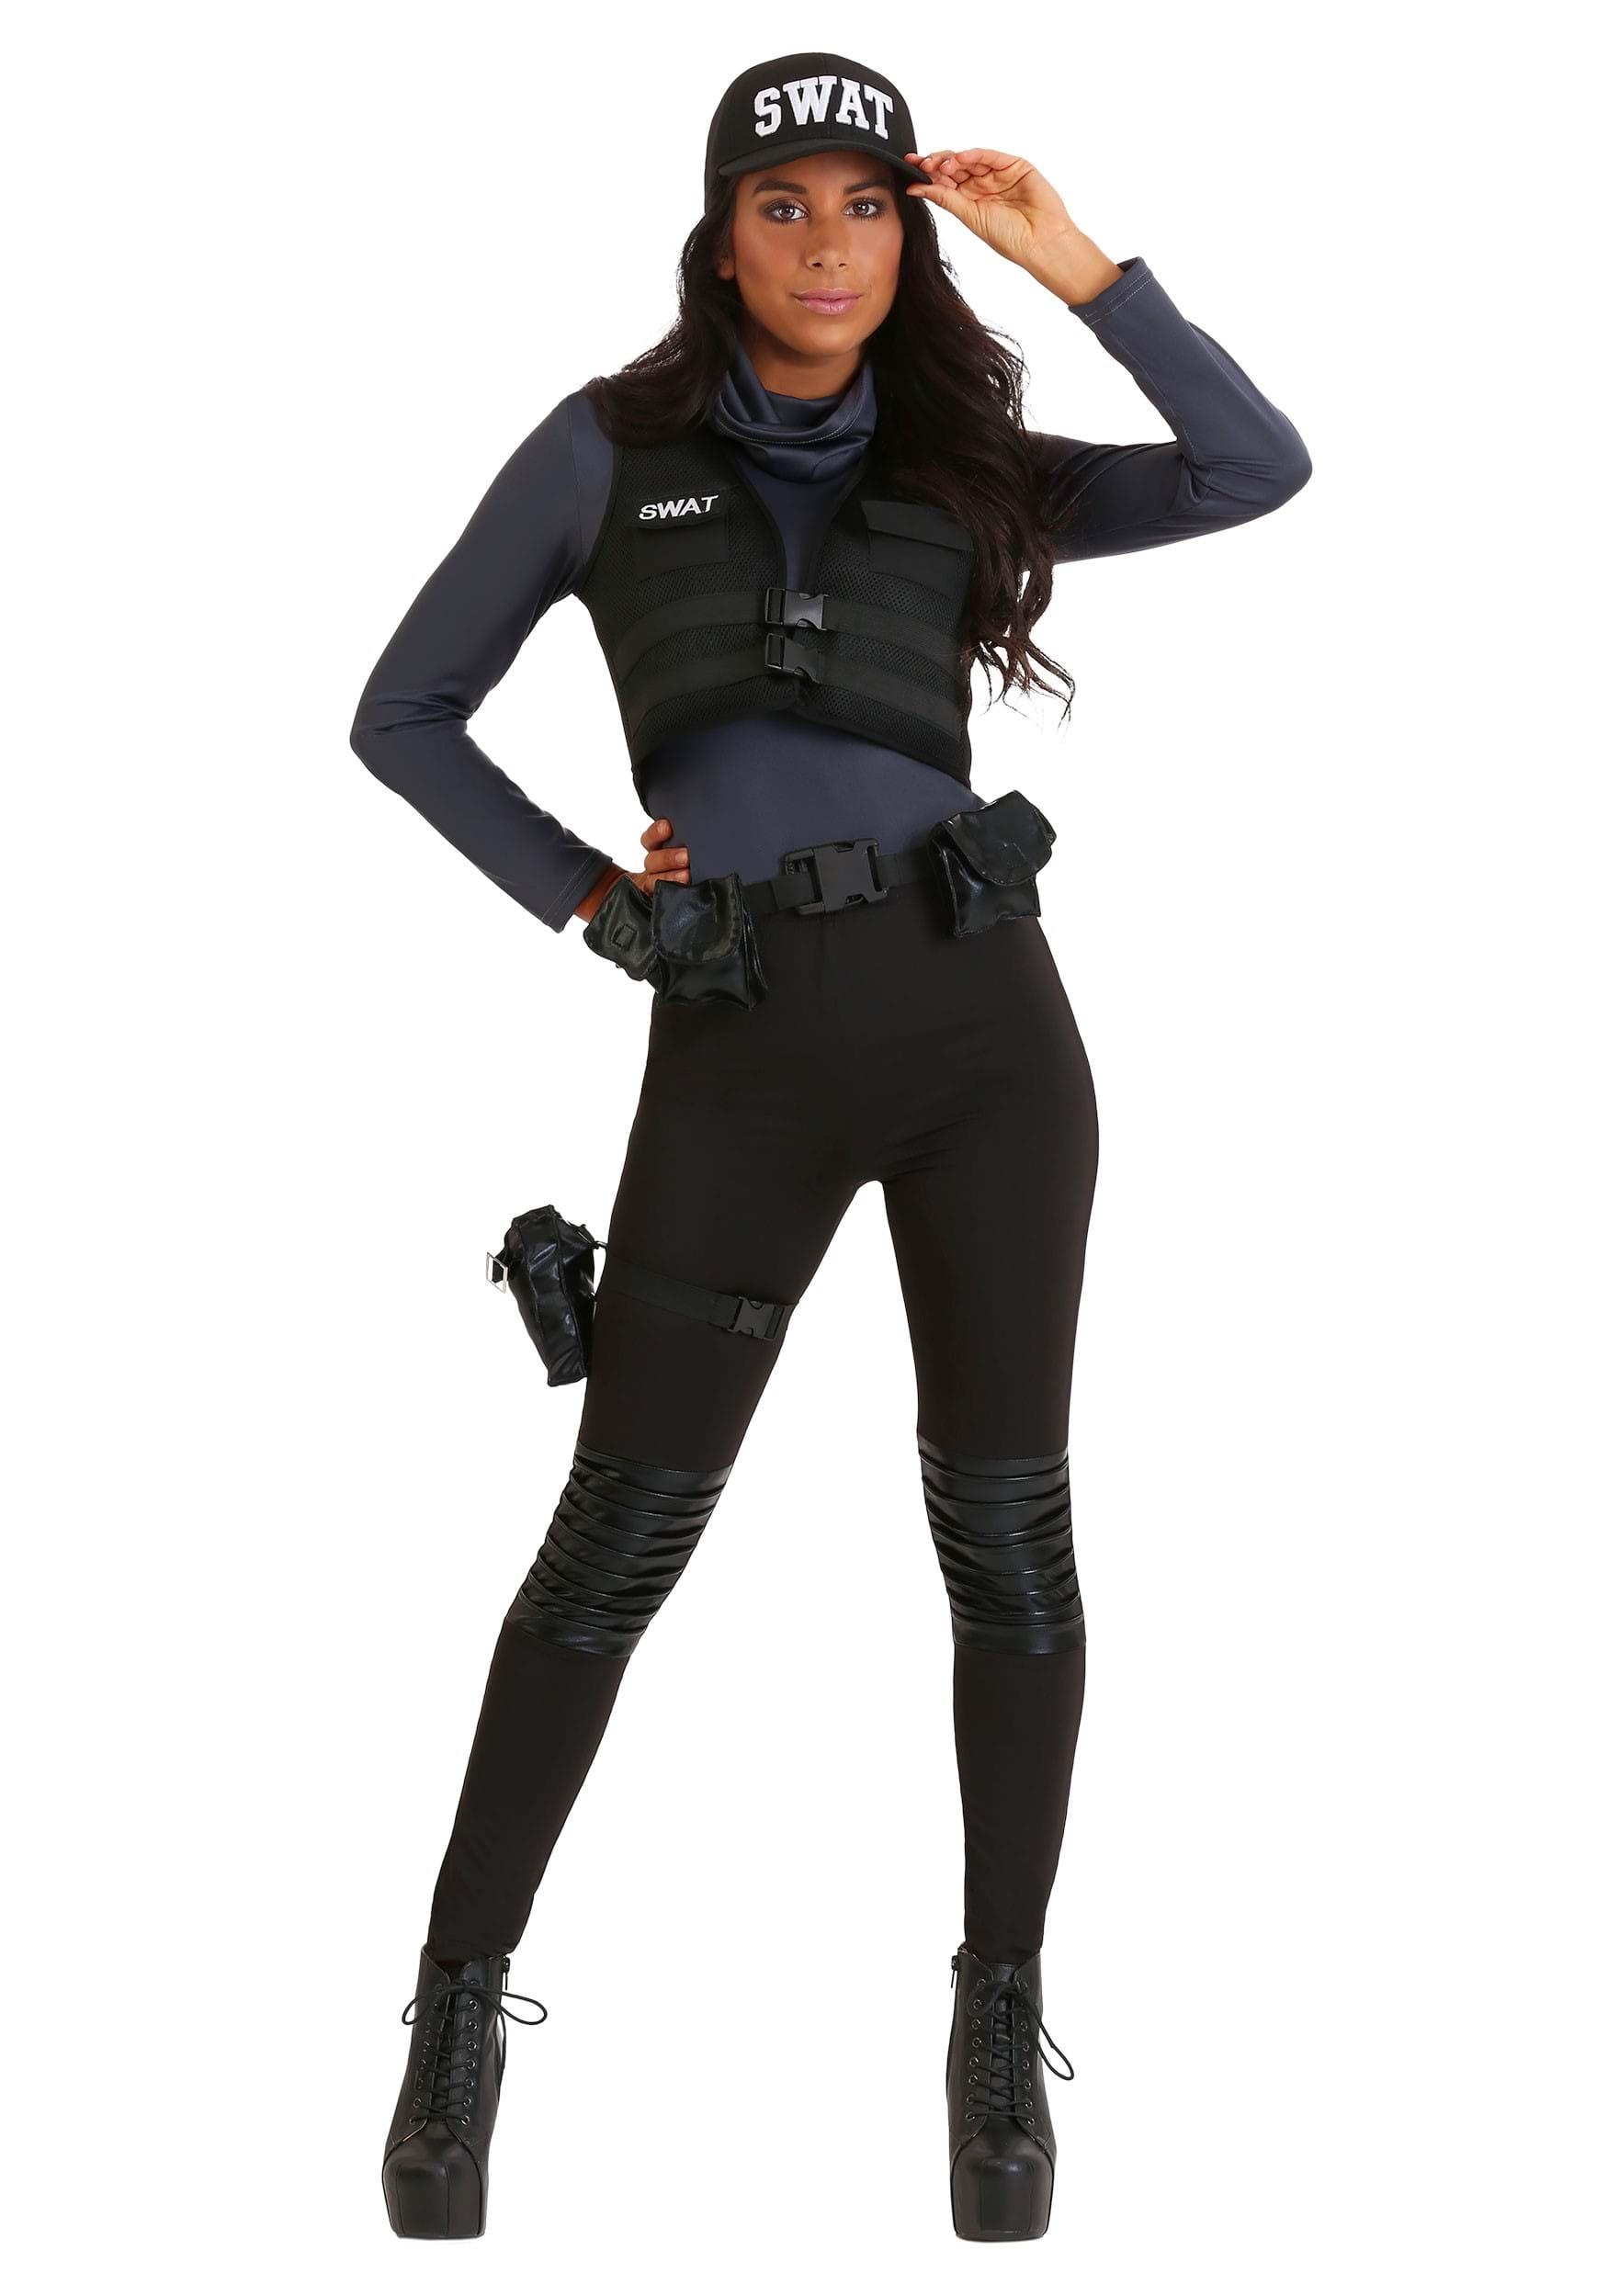 SWAT Babe Women's Costume